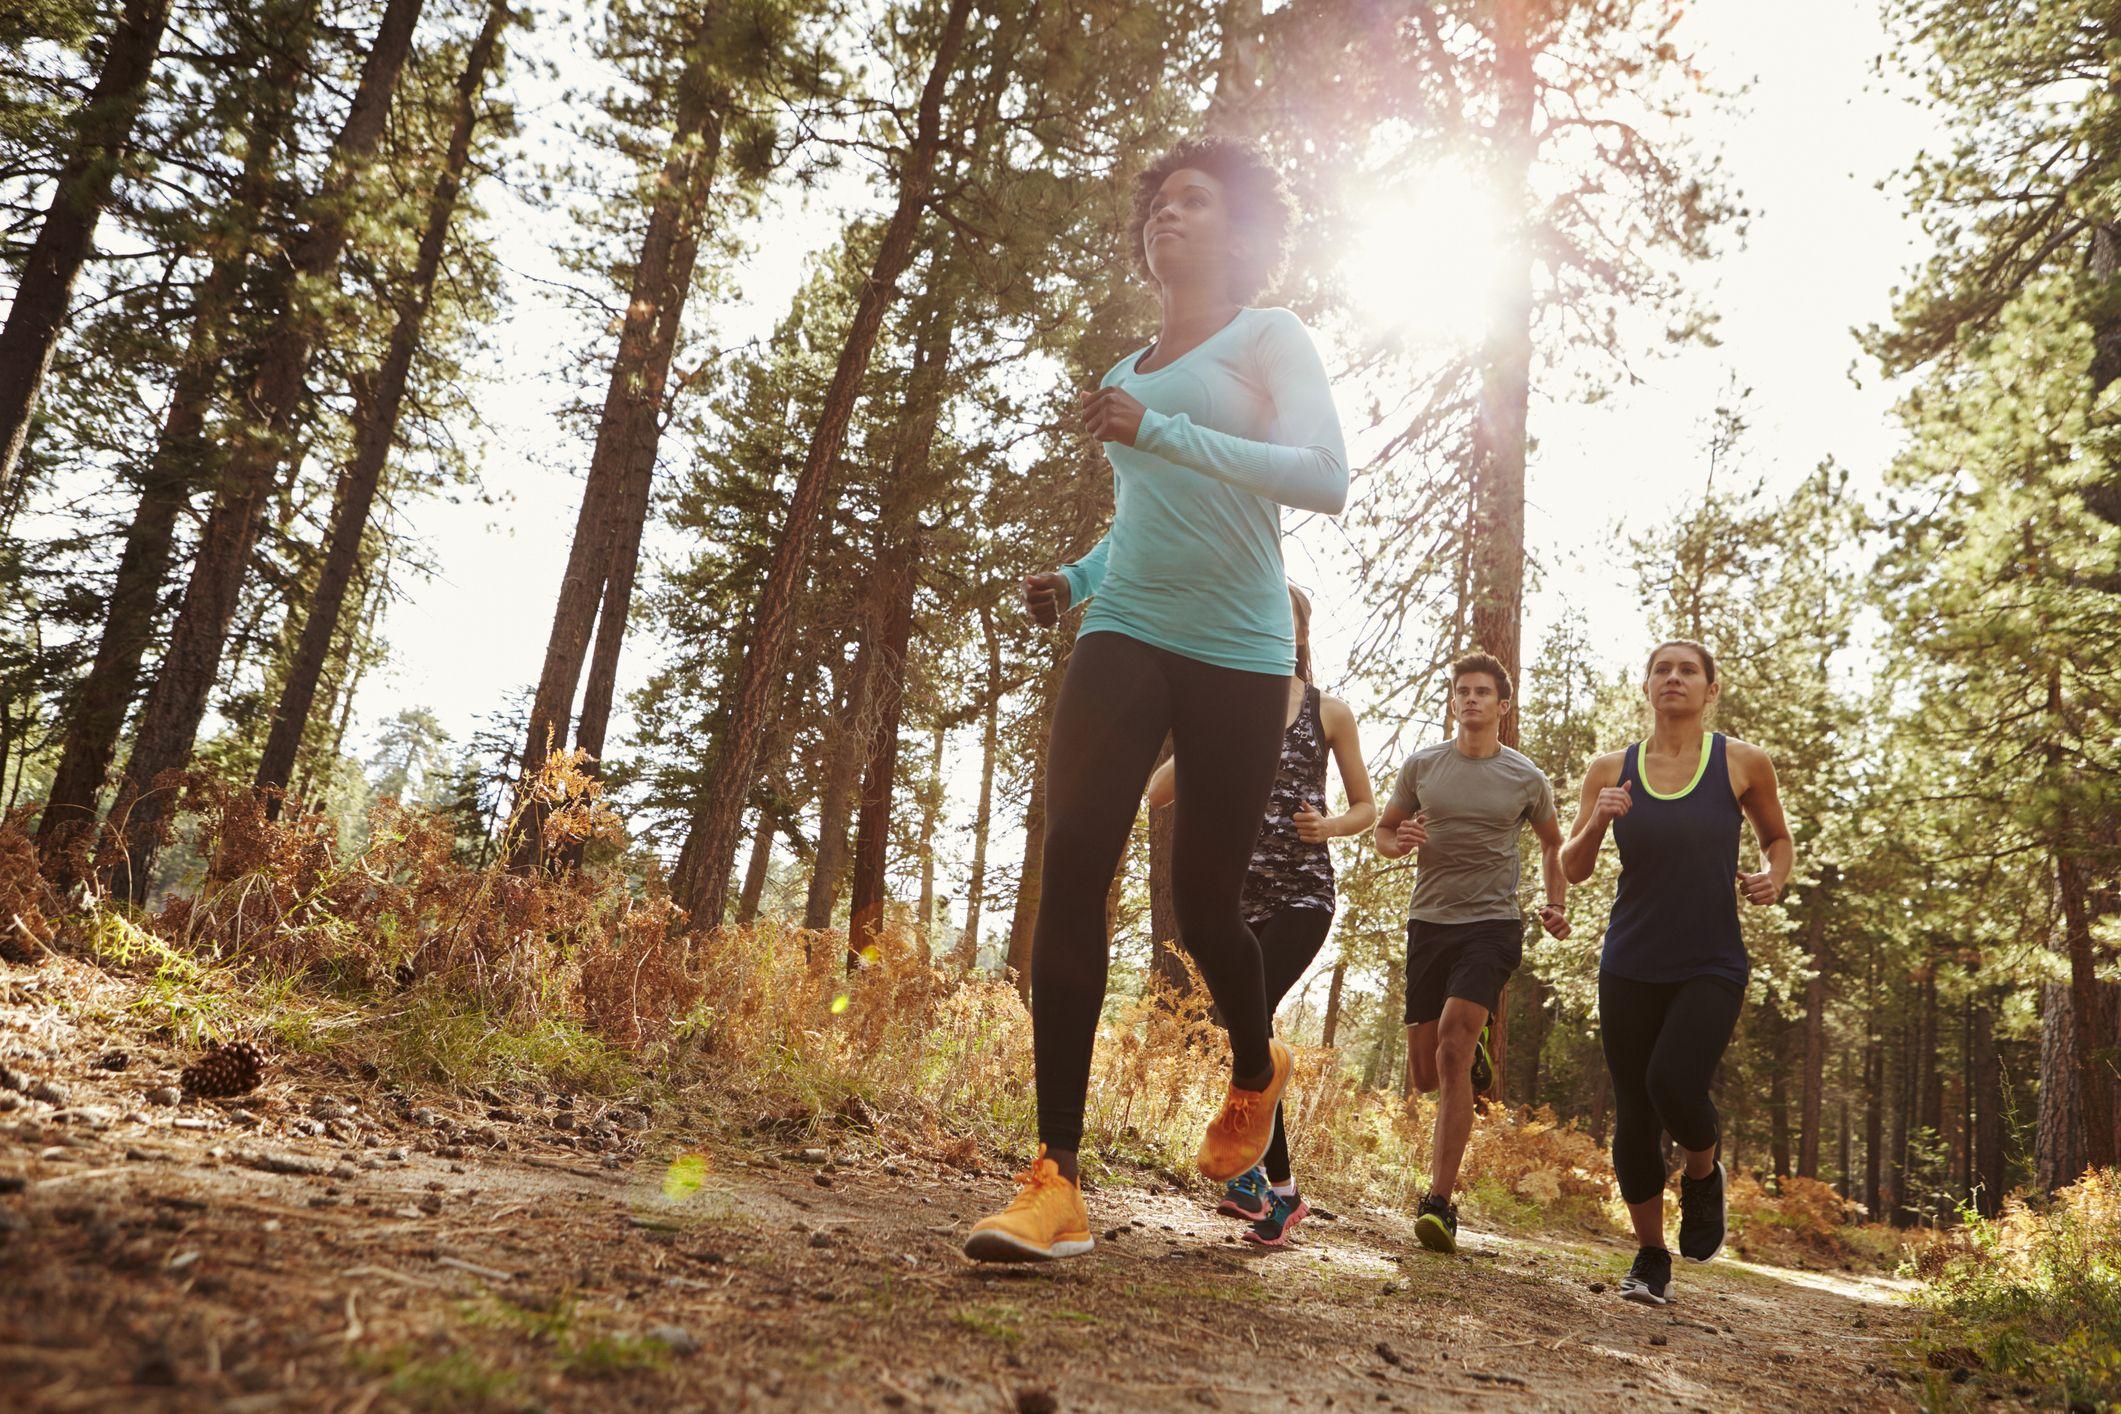 How Your Body Handles Trail Running Versus Road Running